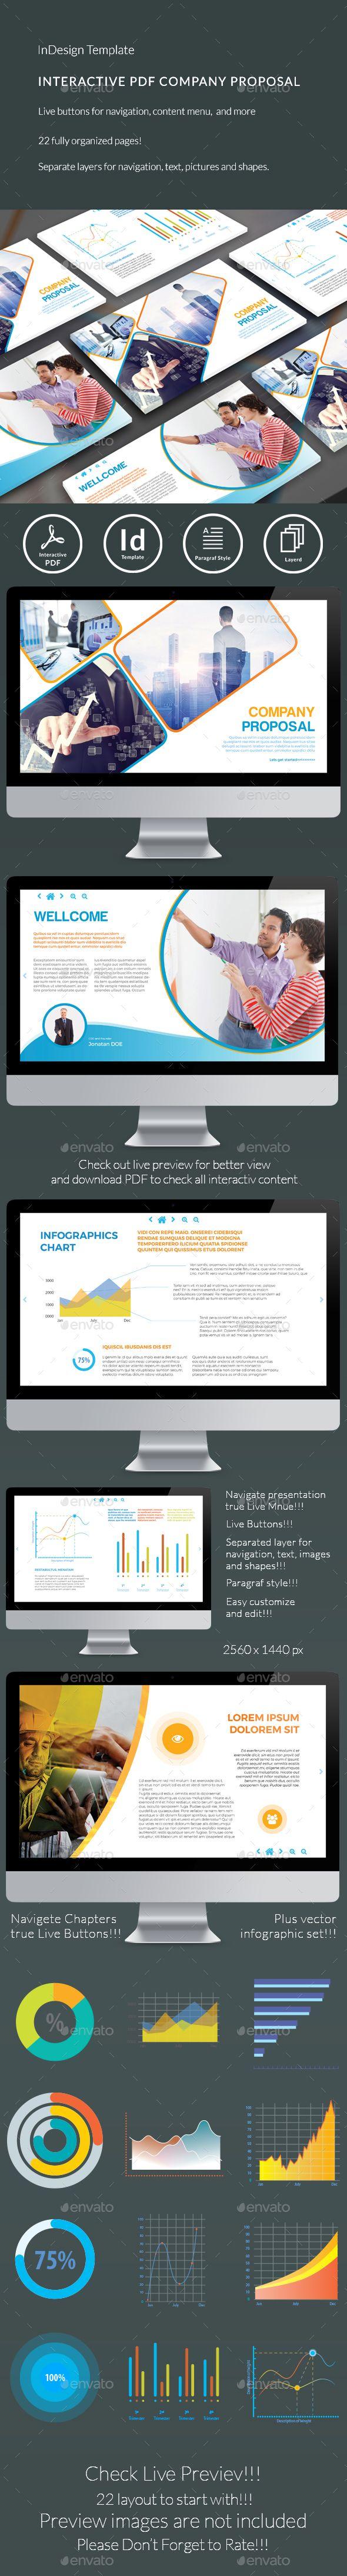 Interactive Company Proposal 120 best e publishing Templates